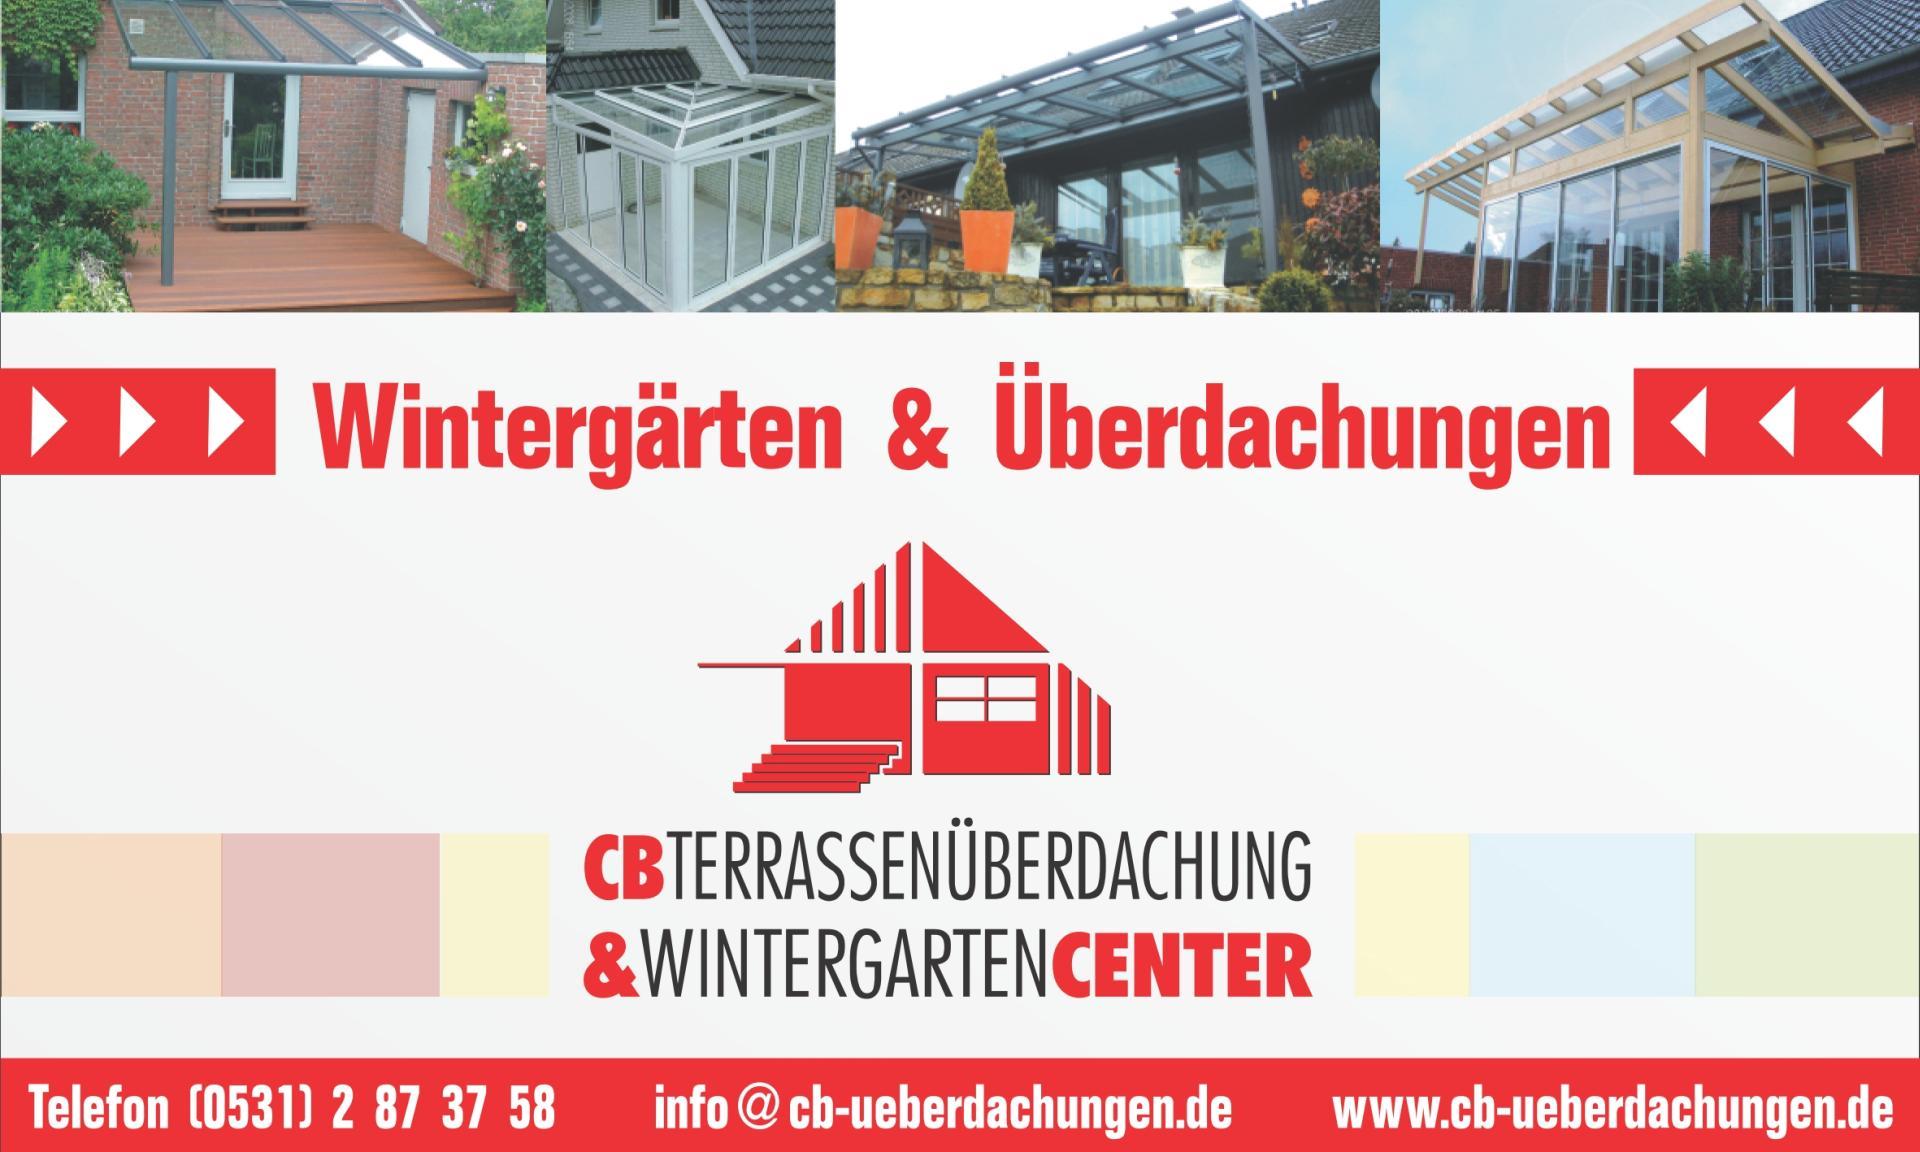 CB Terrassenüberdachung & Wintergartencenter Braunschweig GmbH Vorlingskamp 1 38126 Braunschweig Telefon: (0531) 2873758 Telefax: (0531) 2872743 info@cb-ueberdachungen.de | www.cb-ueberdachungen.de